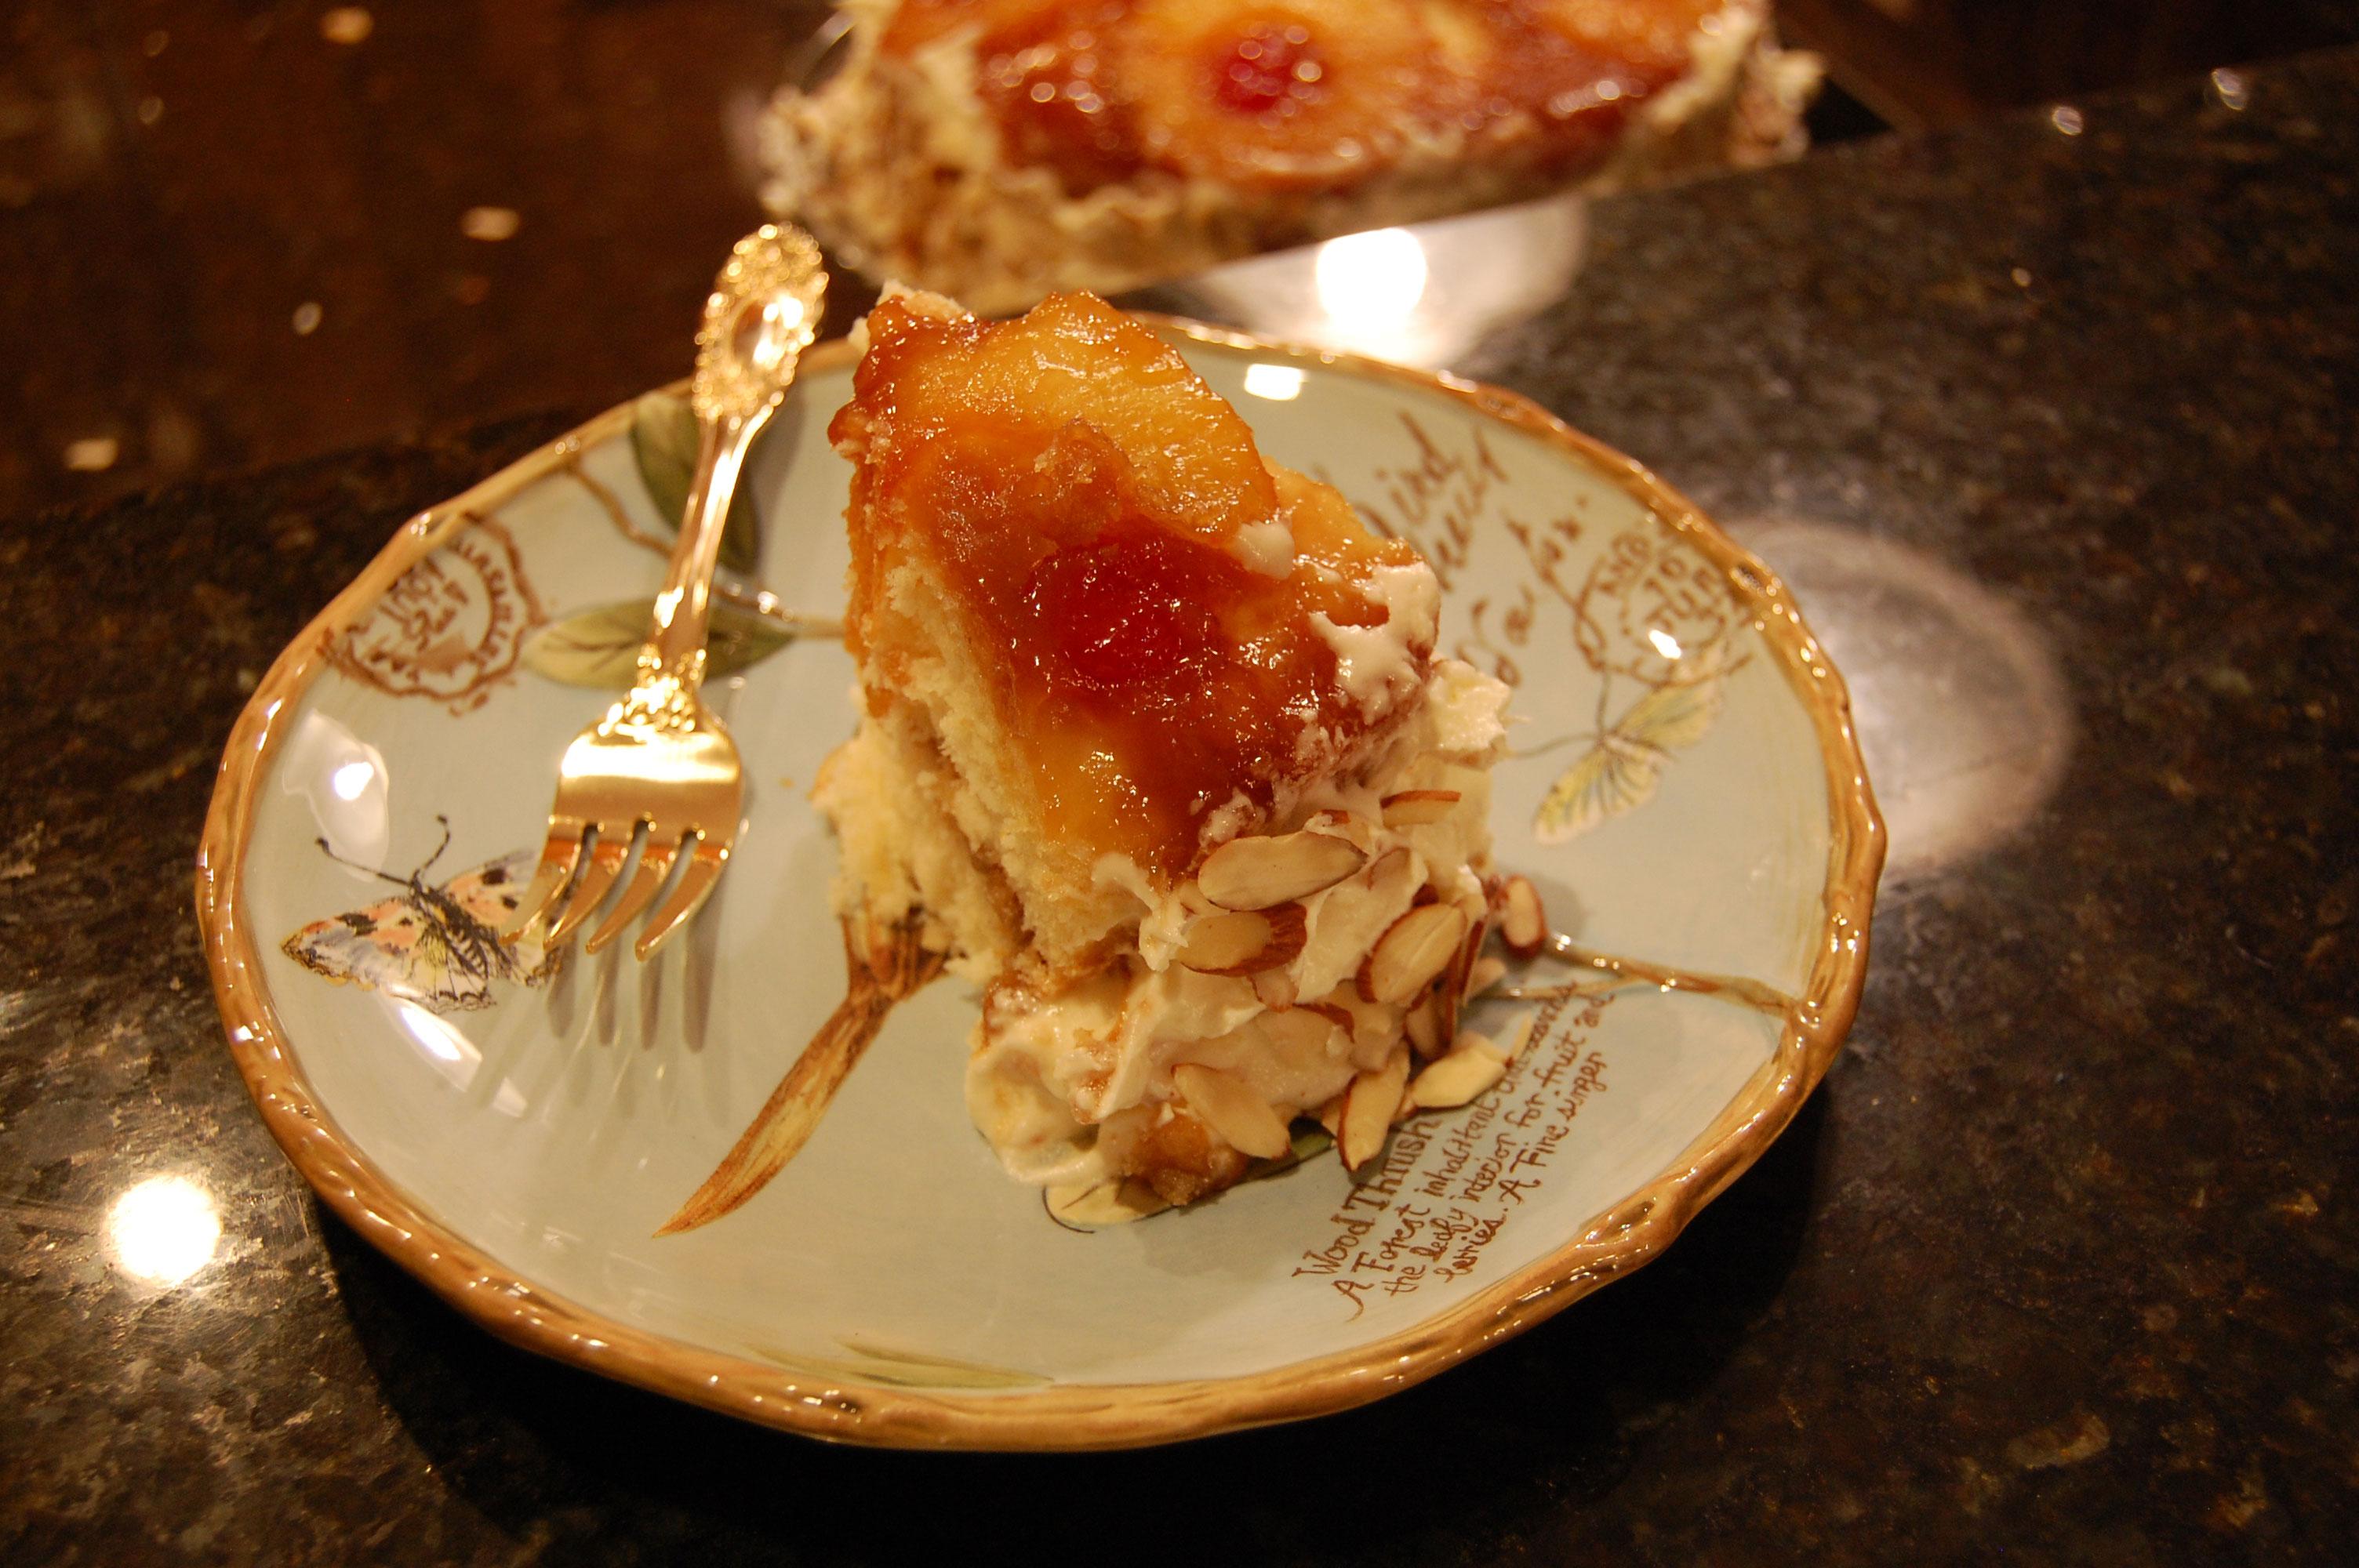 Serving Pineapple Upside Down Cake